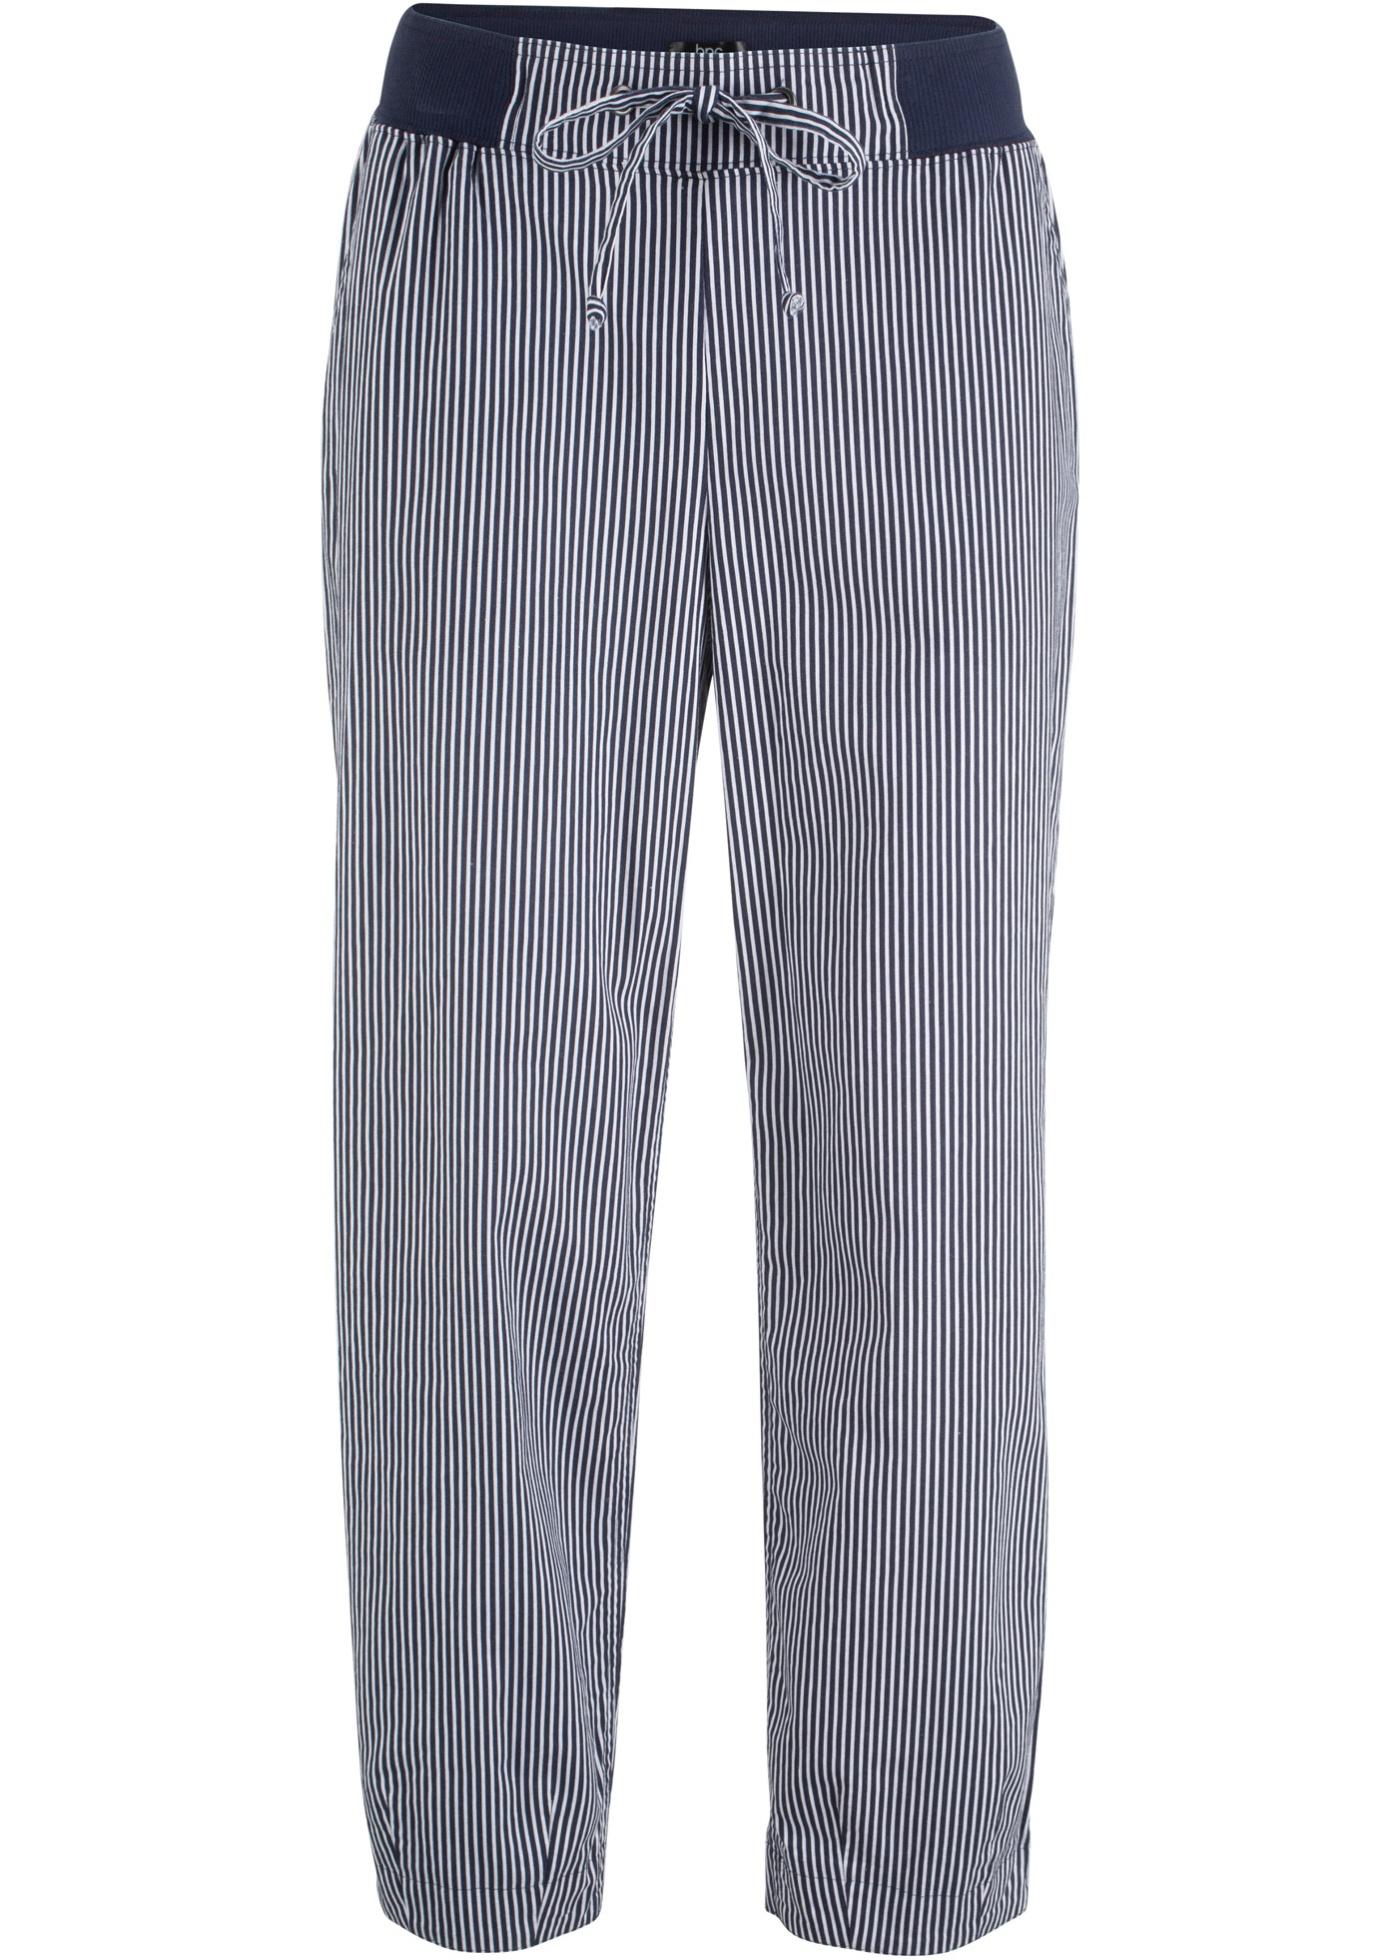 Hosen - Hose aus Leinenmix in 7 8 Länge › bonprix › blau  - Onlineshop Bonprix